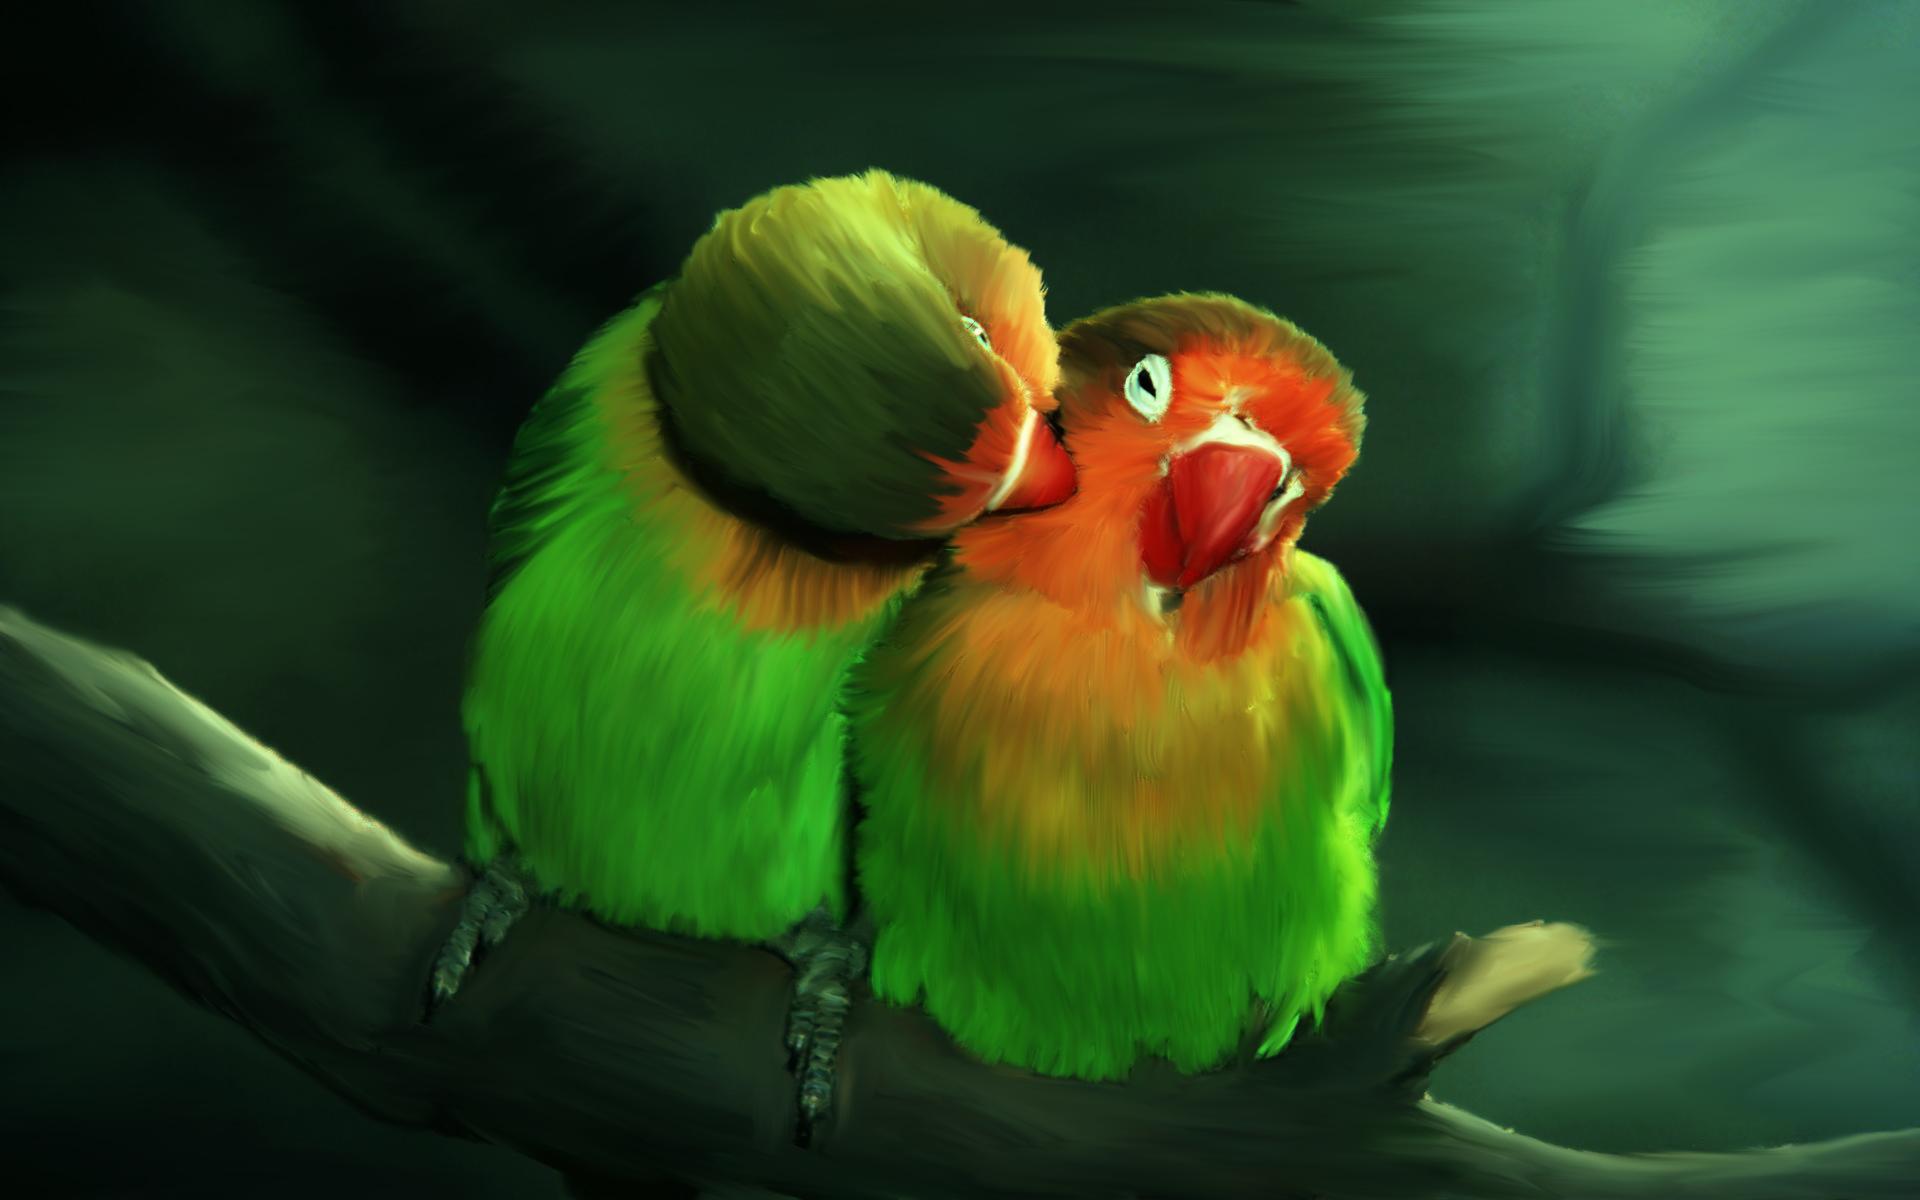 Wallpaper Gallery Love Bird Wallpaper: 18 Beautiful Birds Desktop Wallpapers